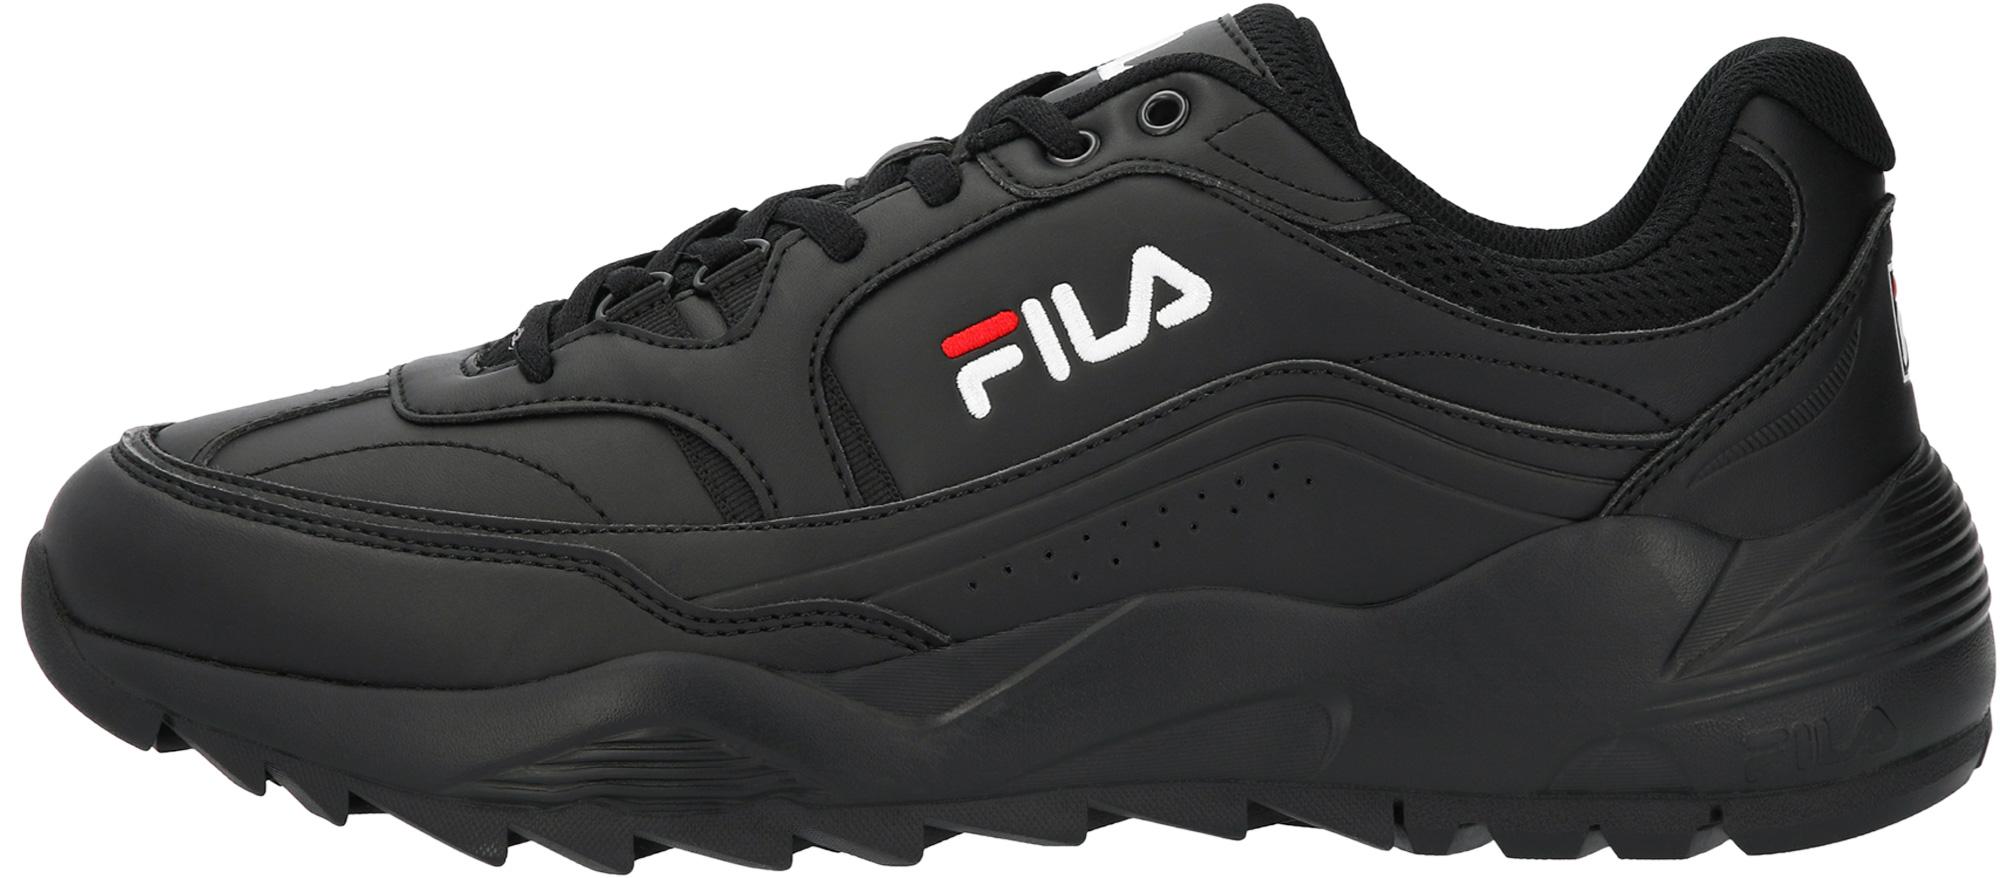 FILA Кроссовки мужские FILA Overtake Low, размер 44 fila кроссовки мужские fila attrek размер 44